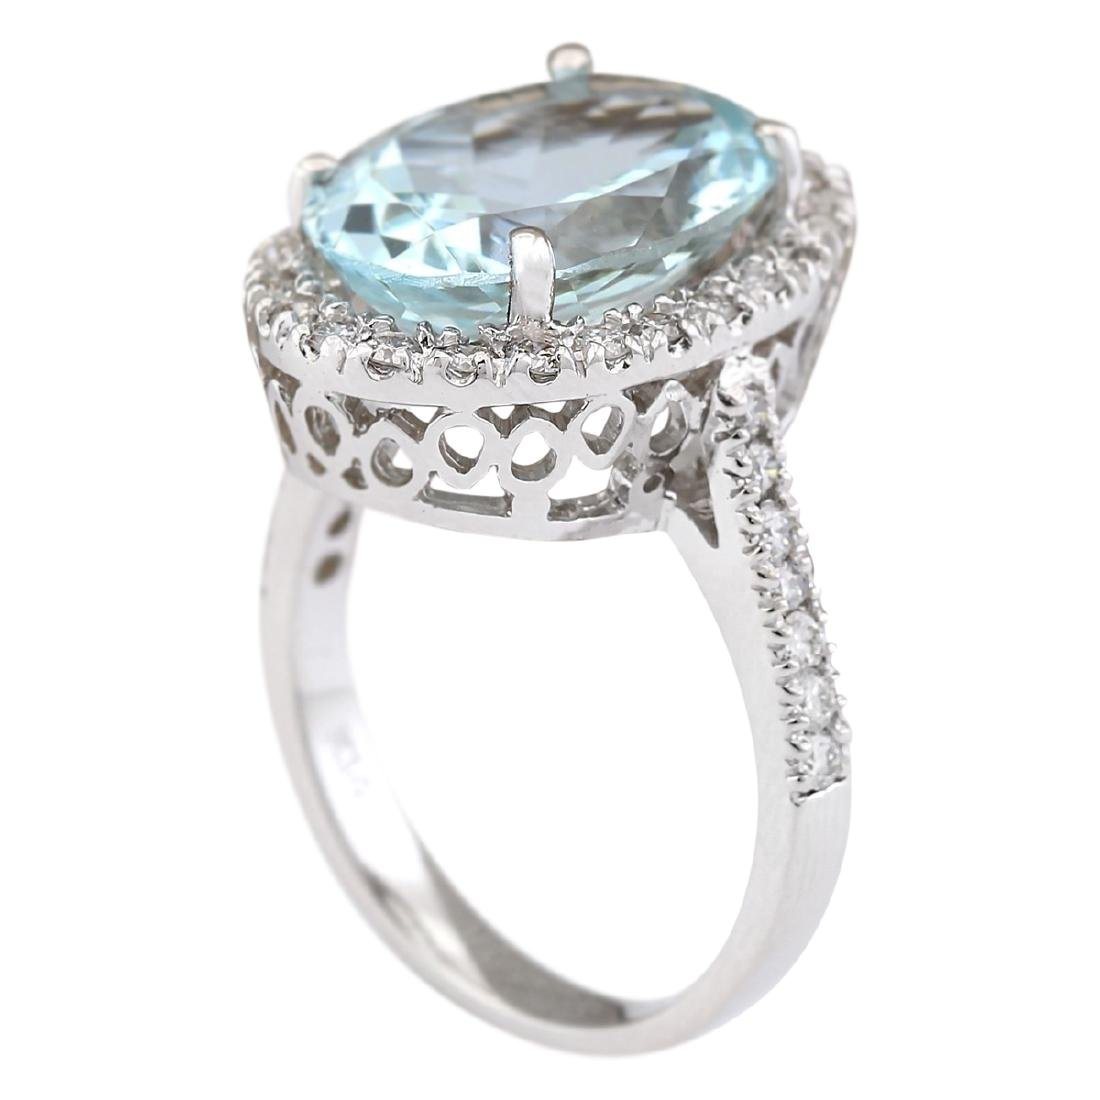 6.90 CTW Natural Aquamarine And Diamond Ring In 18K - 3